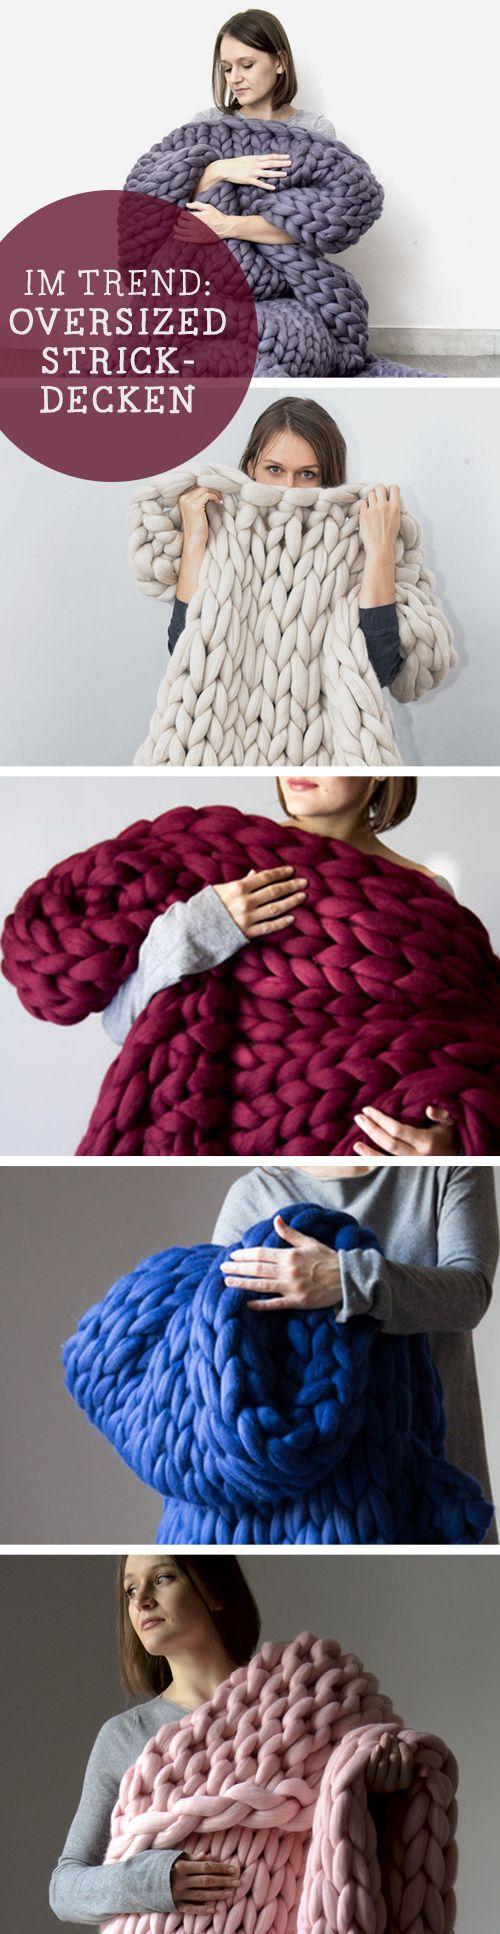 strick im trend kuschelige decken in bergr e knitting trend oversized blankets home decor. Black Bedroom Furniture Sets. Home Design Ideas